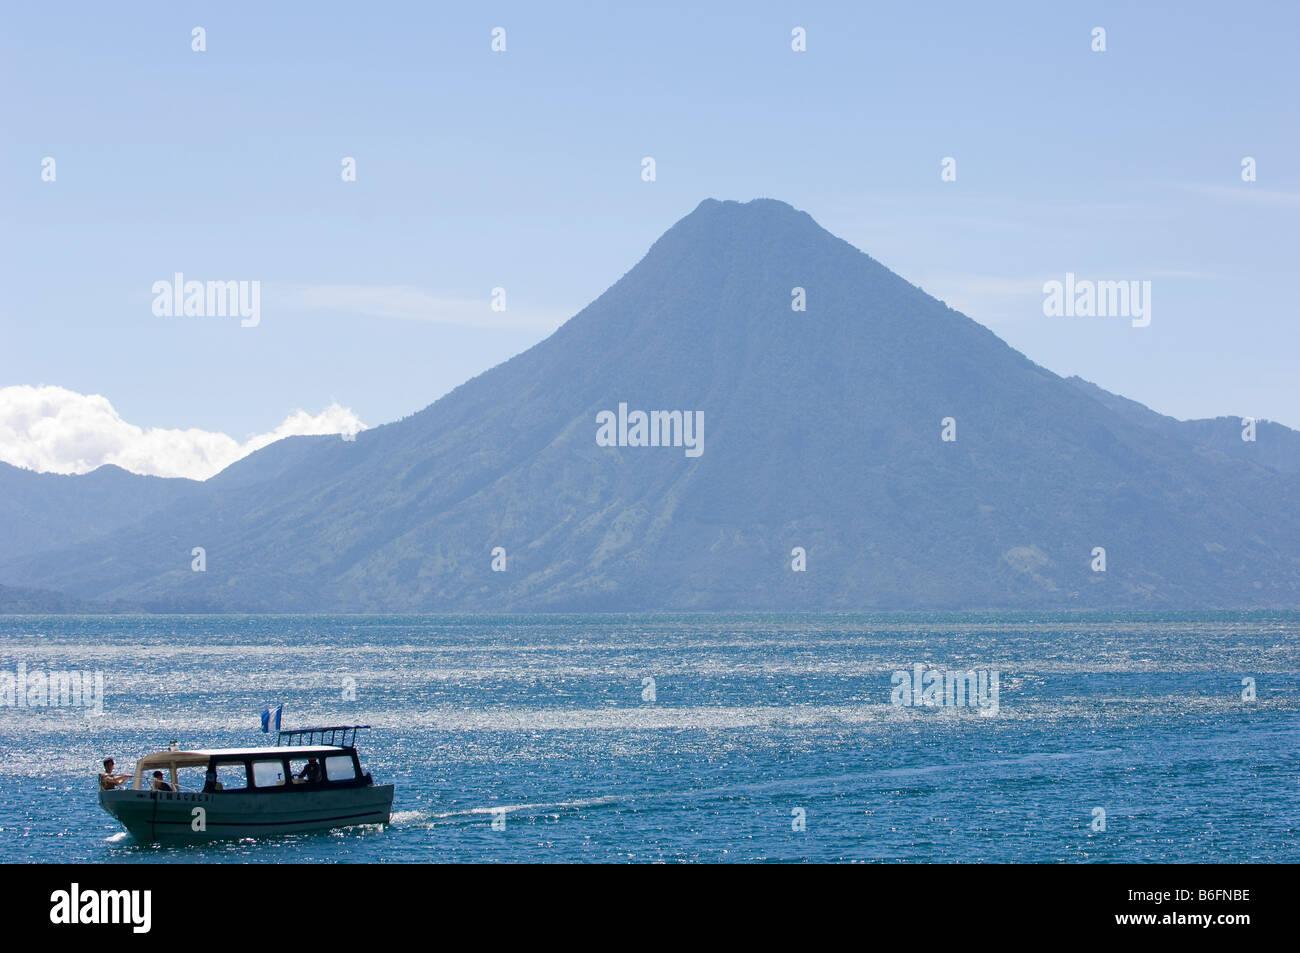 Lago de Atitlan, Guatemala. Passengerboat plying the lake. Volcan San Pedro on background - Stock Image